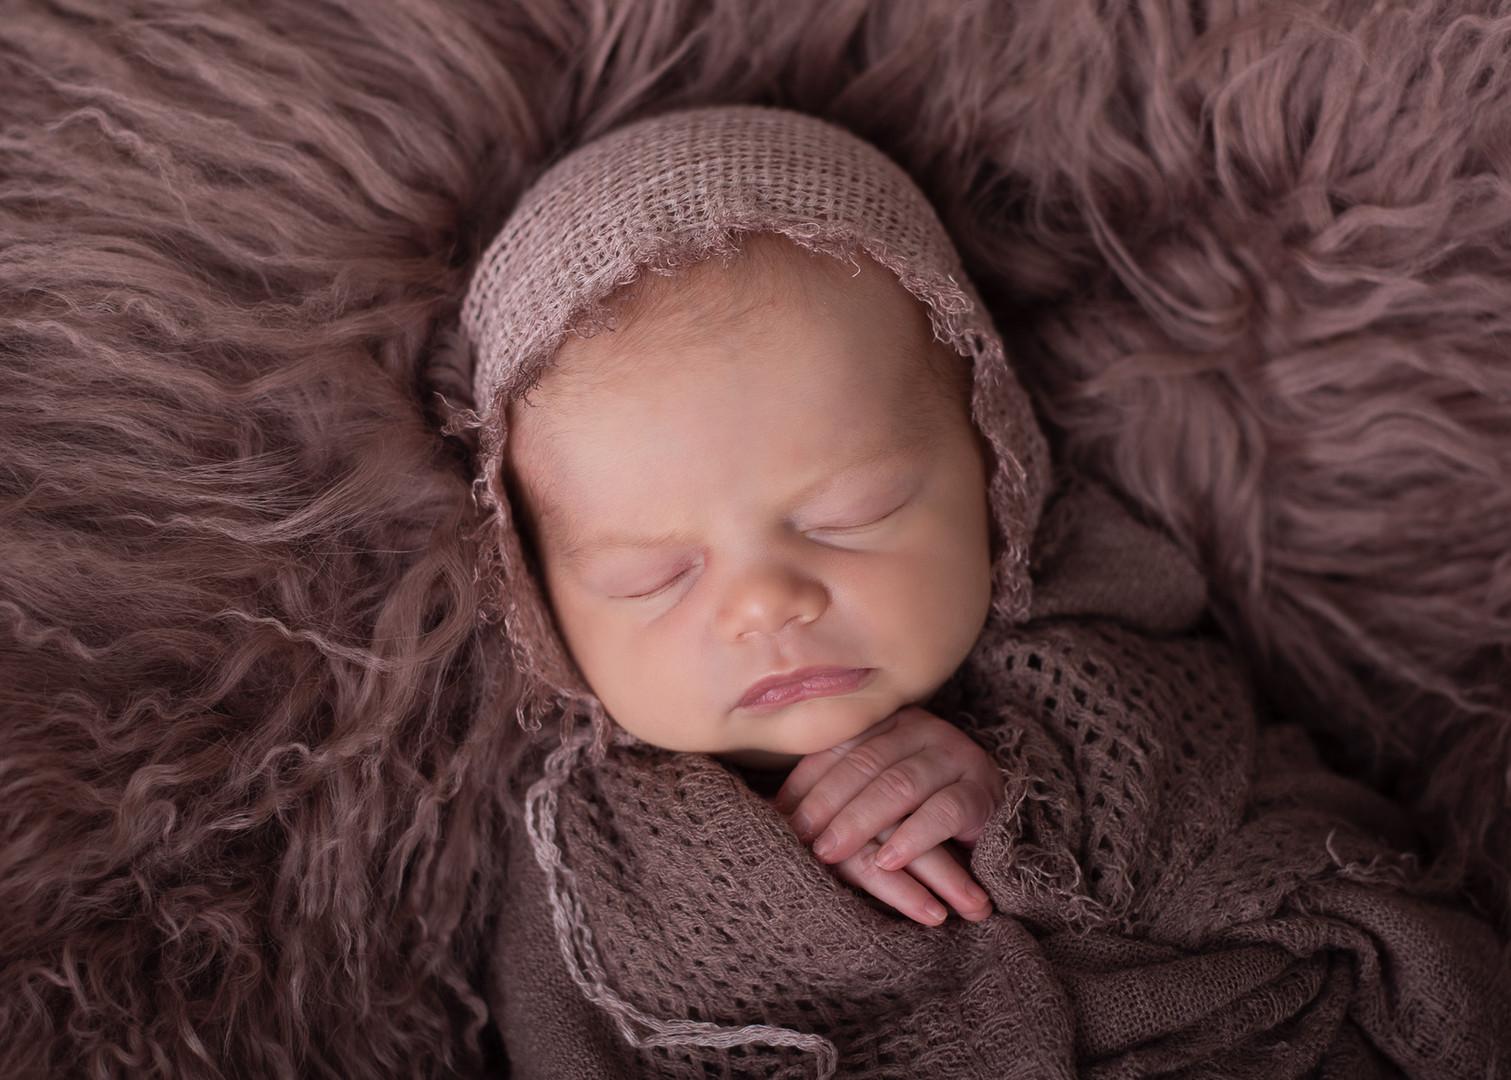 Falmouth Maine Photographer - Newborn-14.jpg